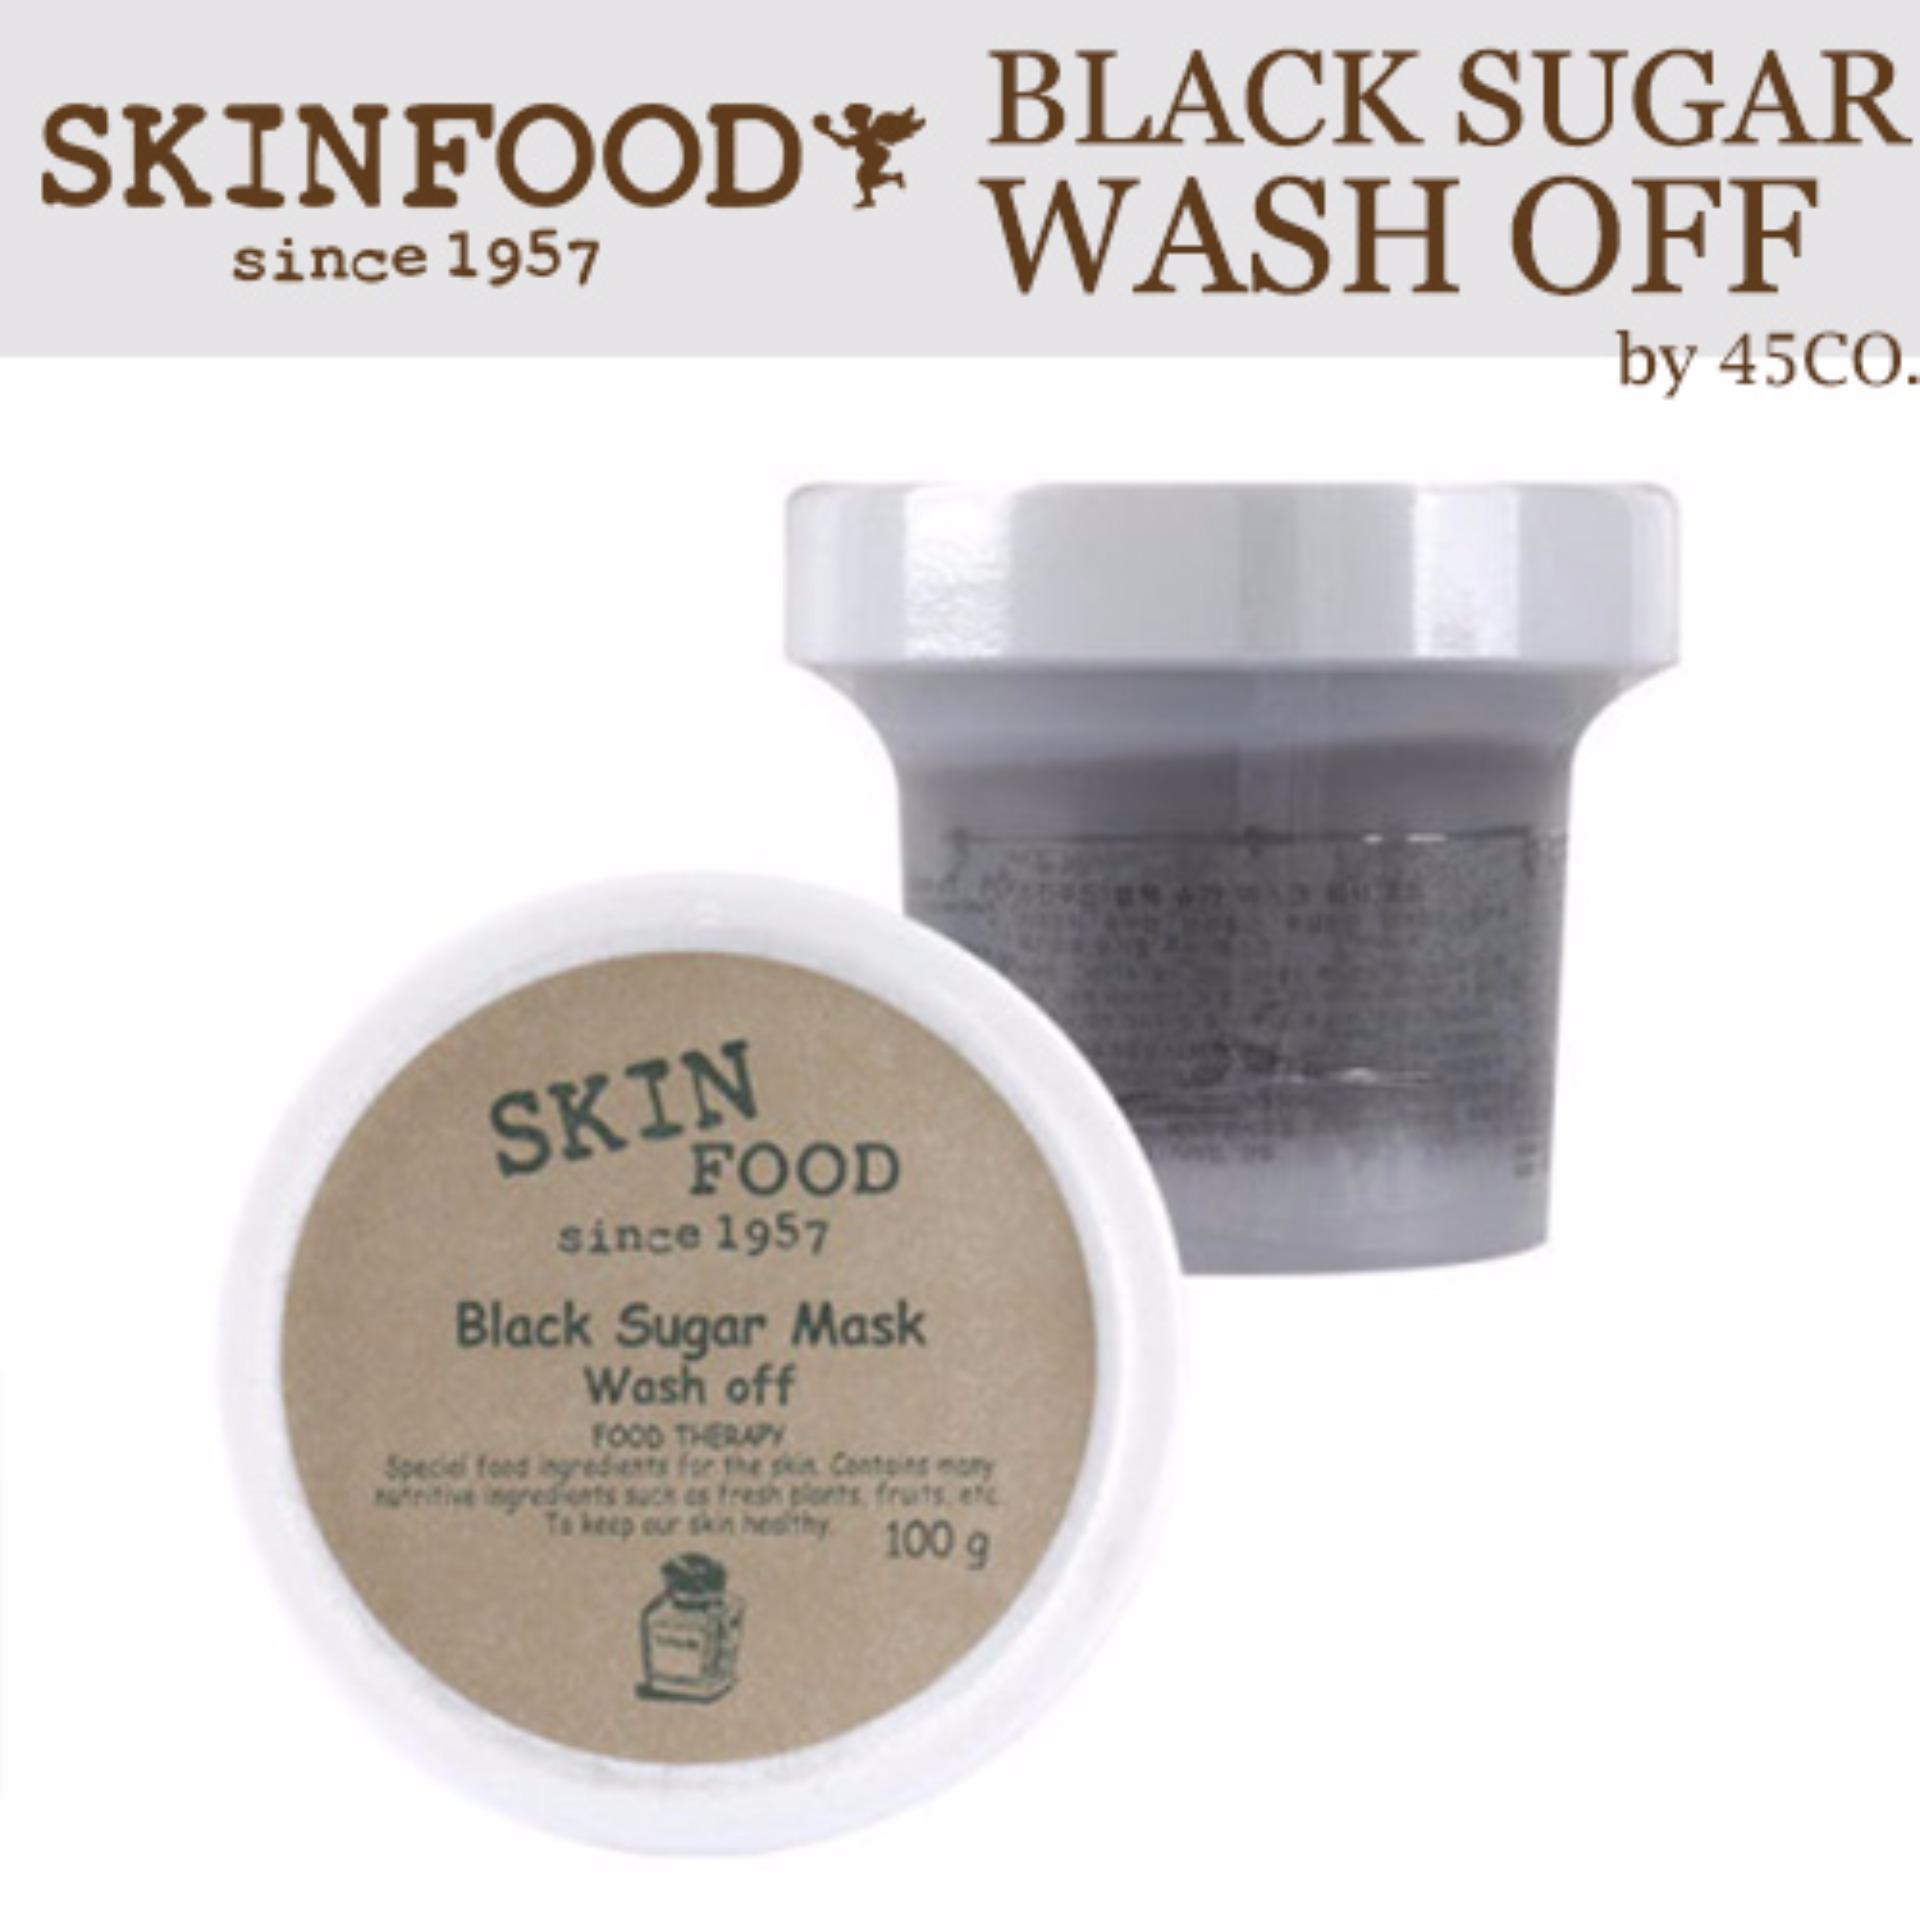 Buy Skinfood Black Sugar Mask Wash Off 100g Intl Singapore Skin Food Honey 100gr